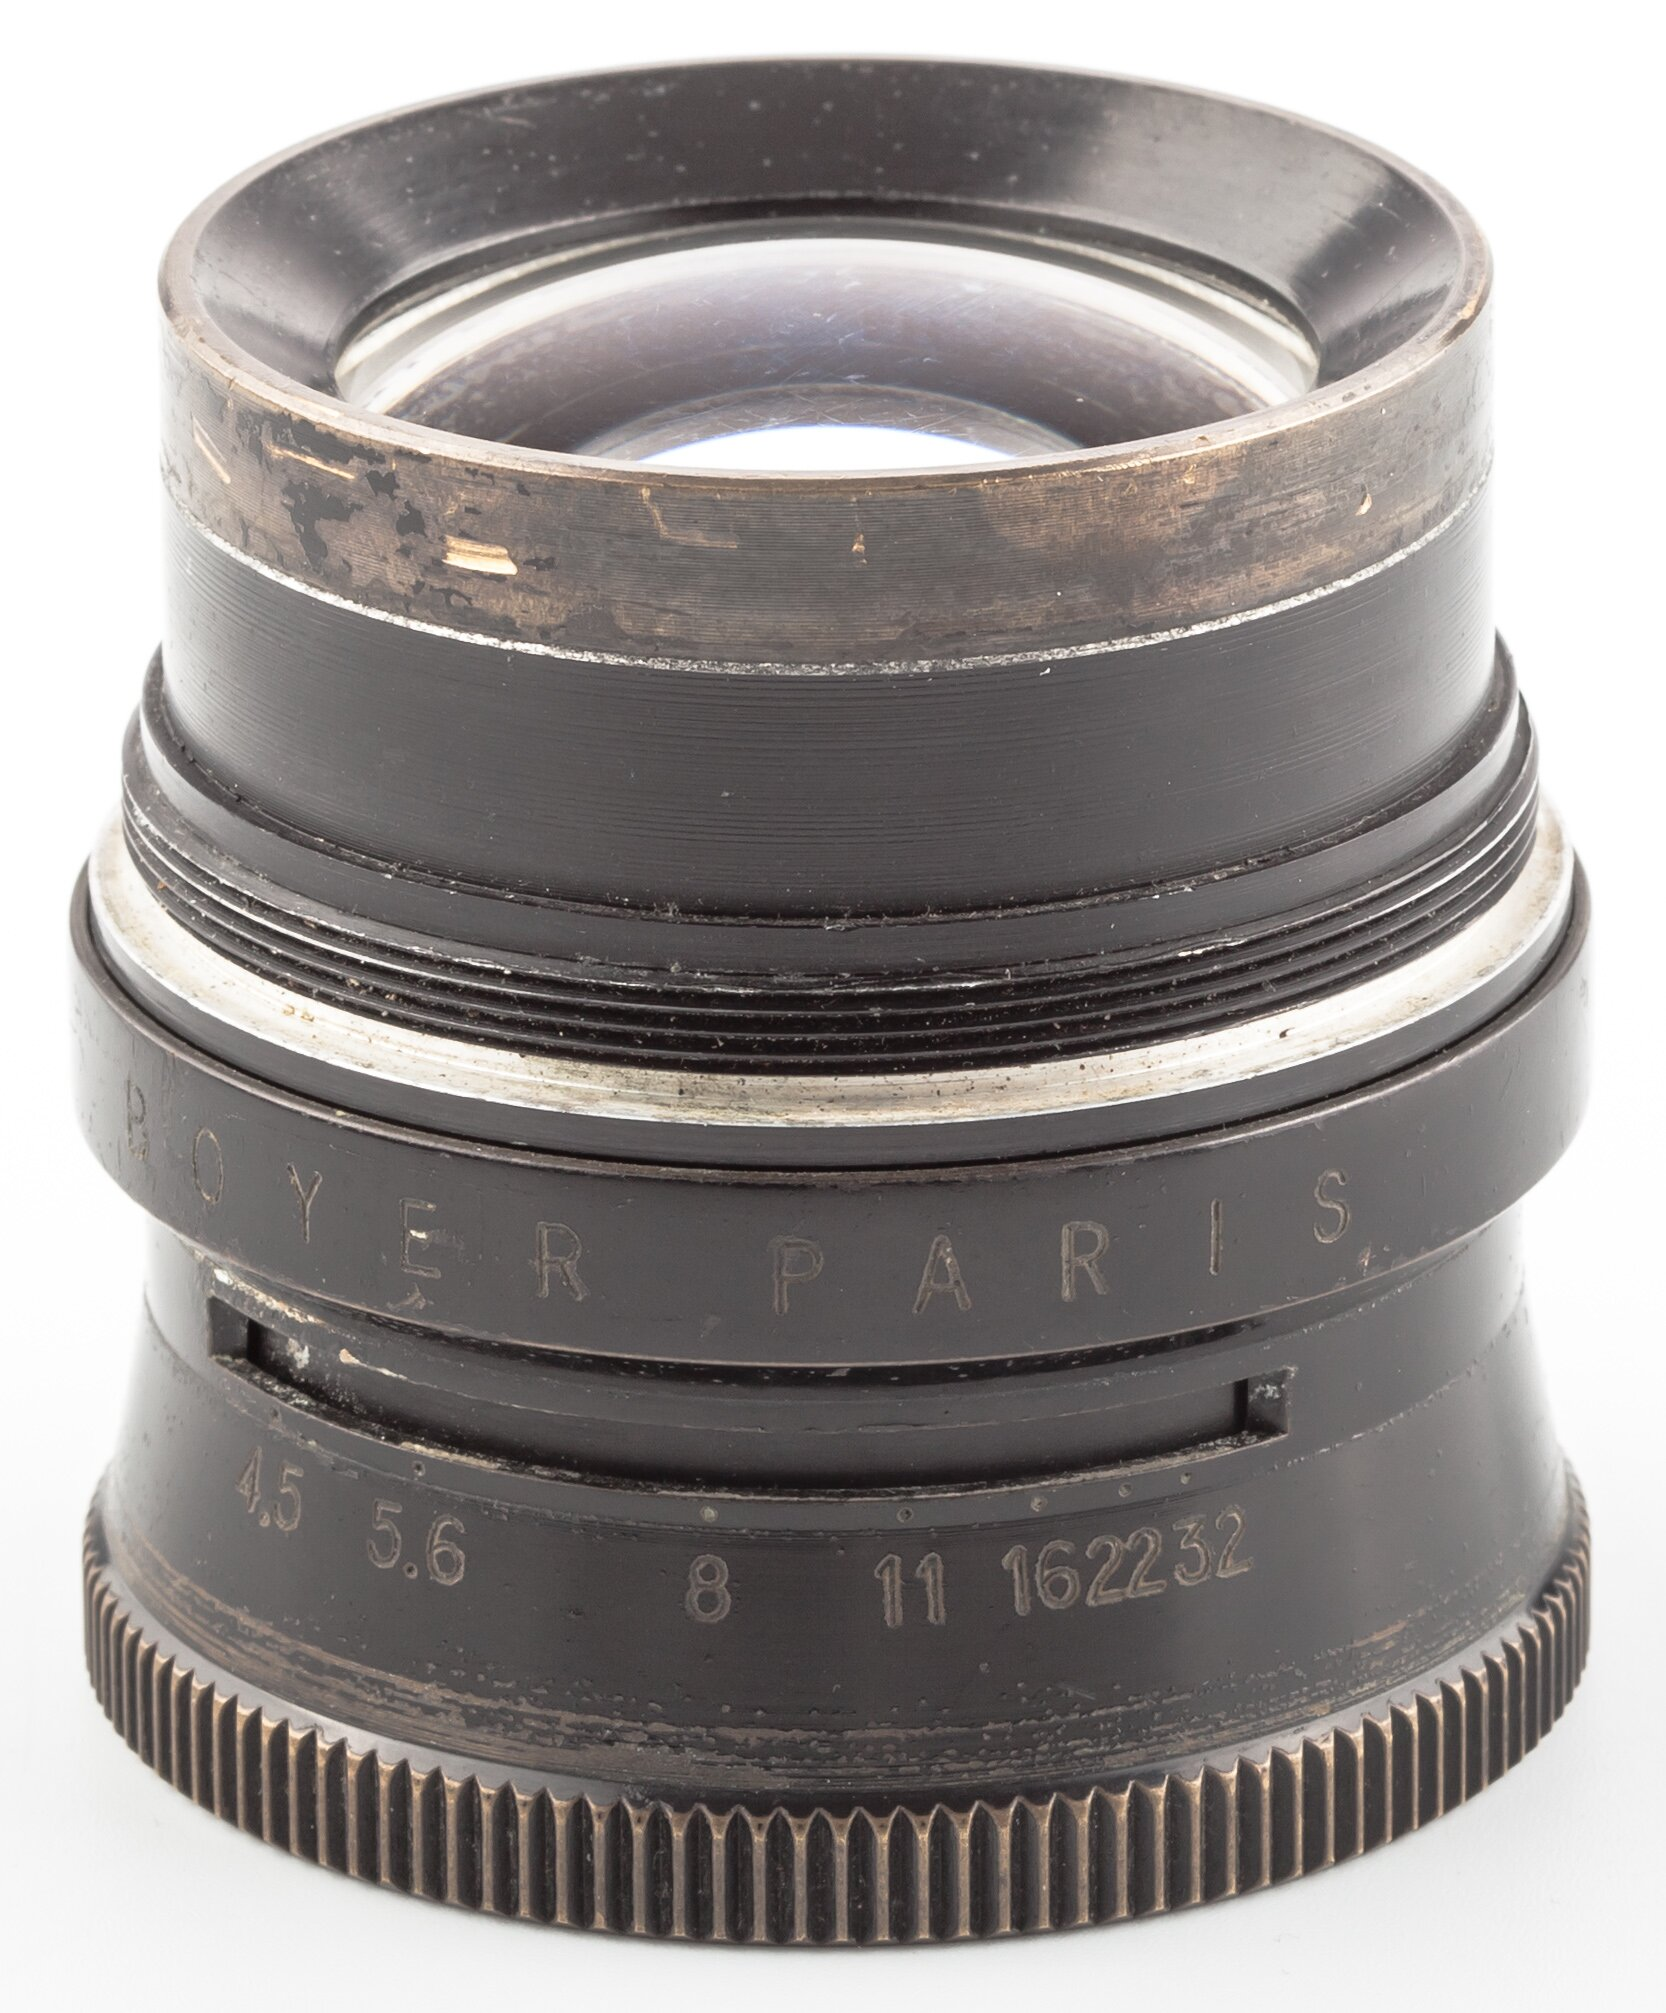 "Boyer Paris Saphir ""B"" 4,5/210mm"